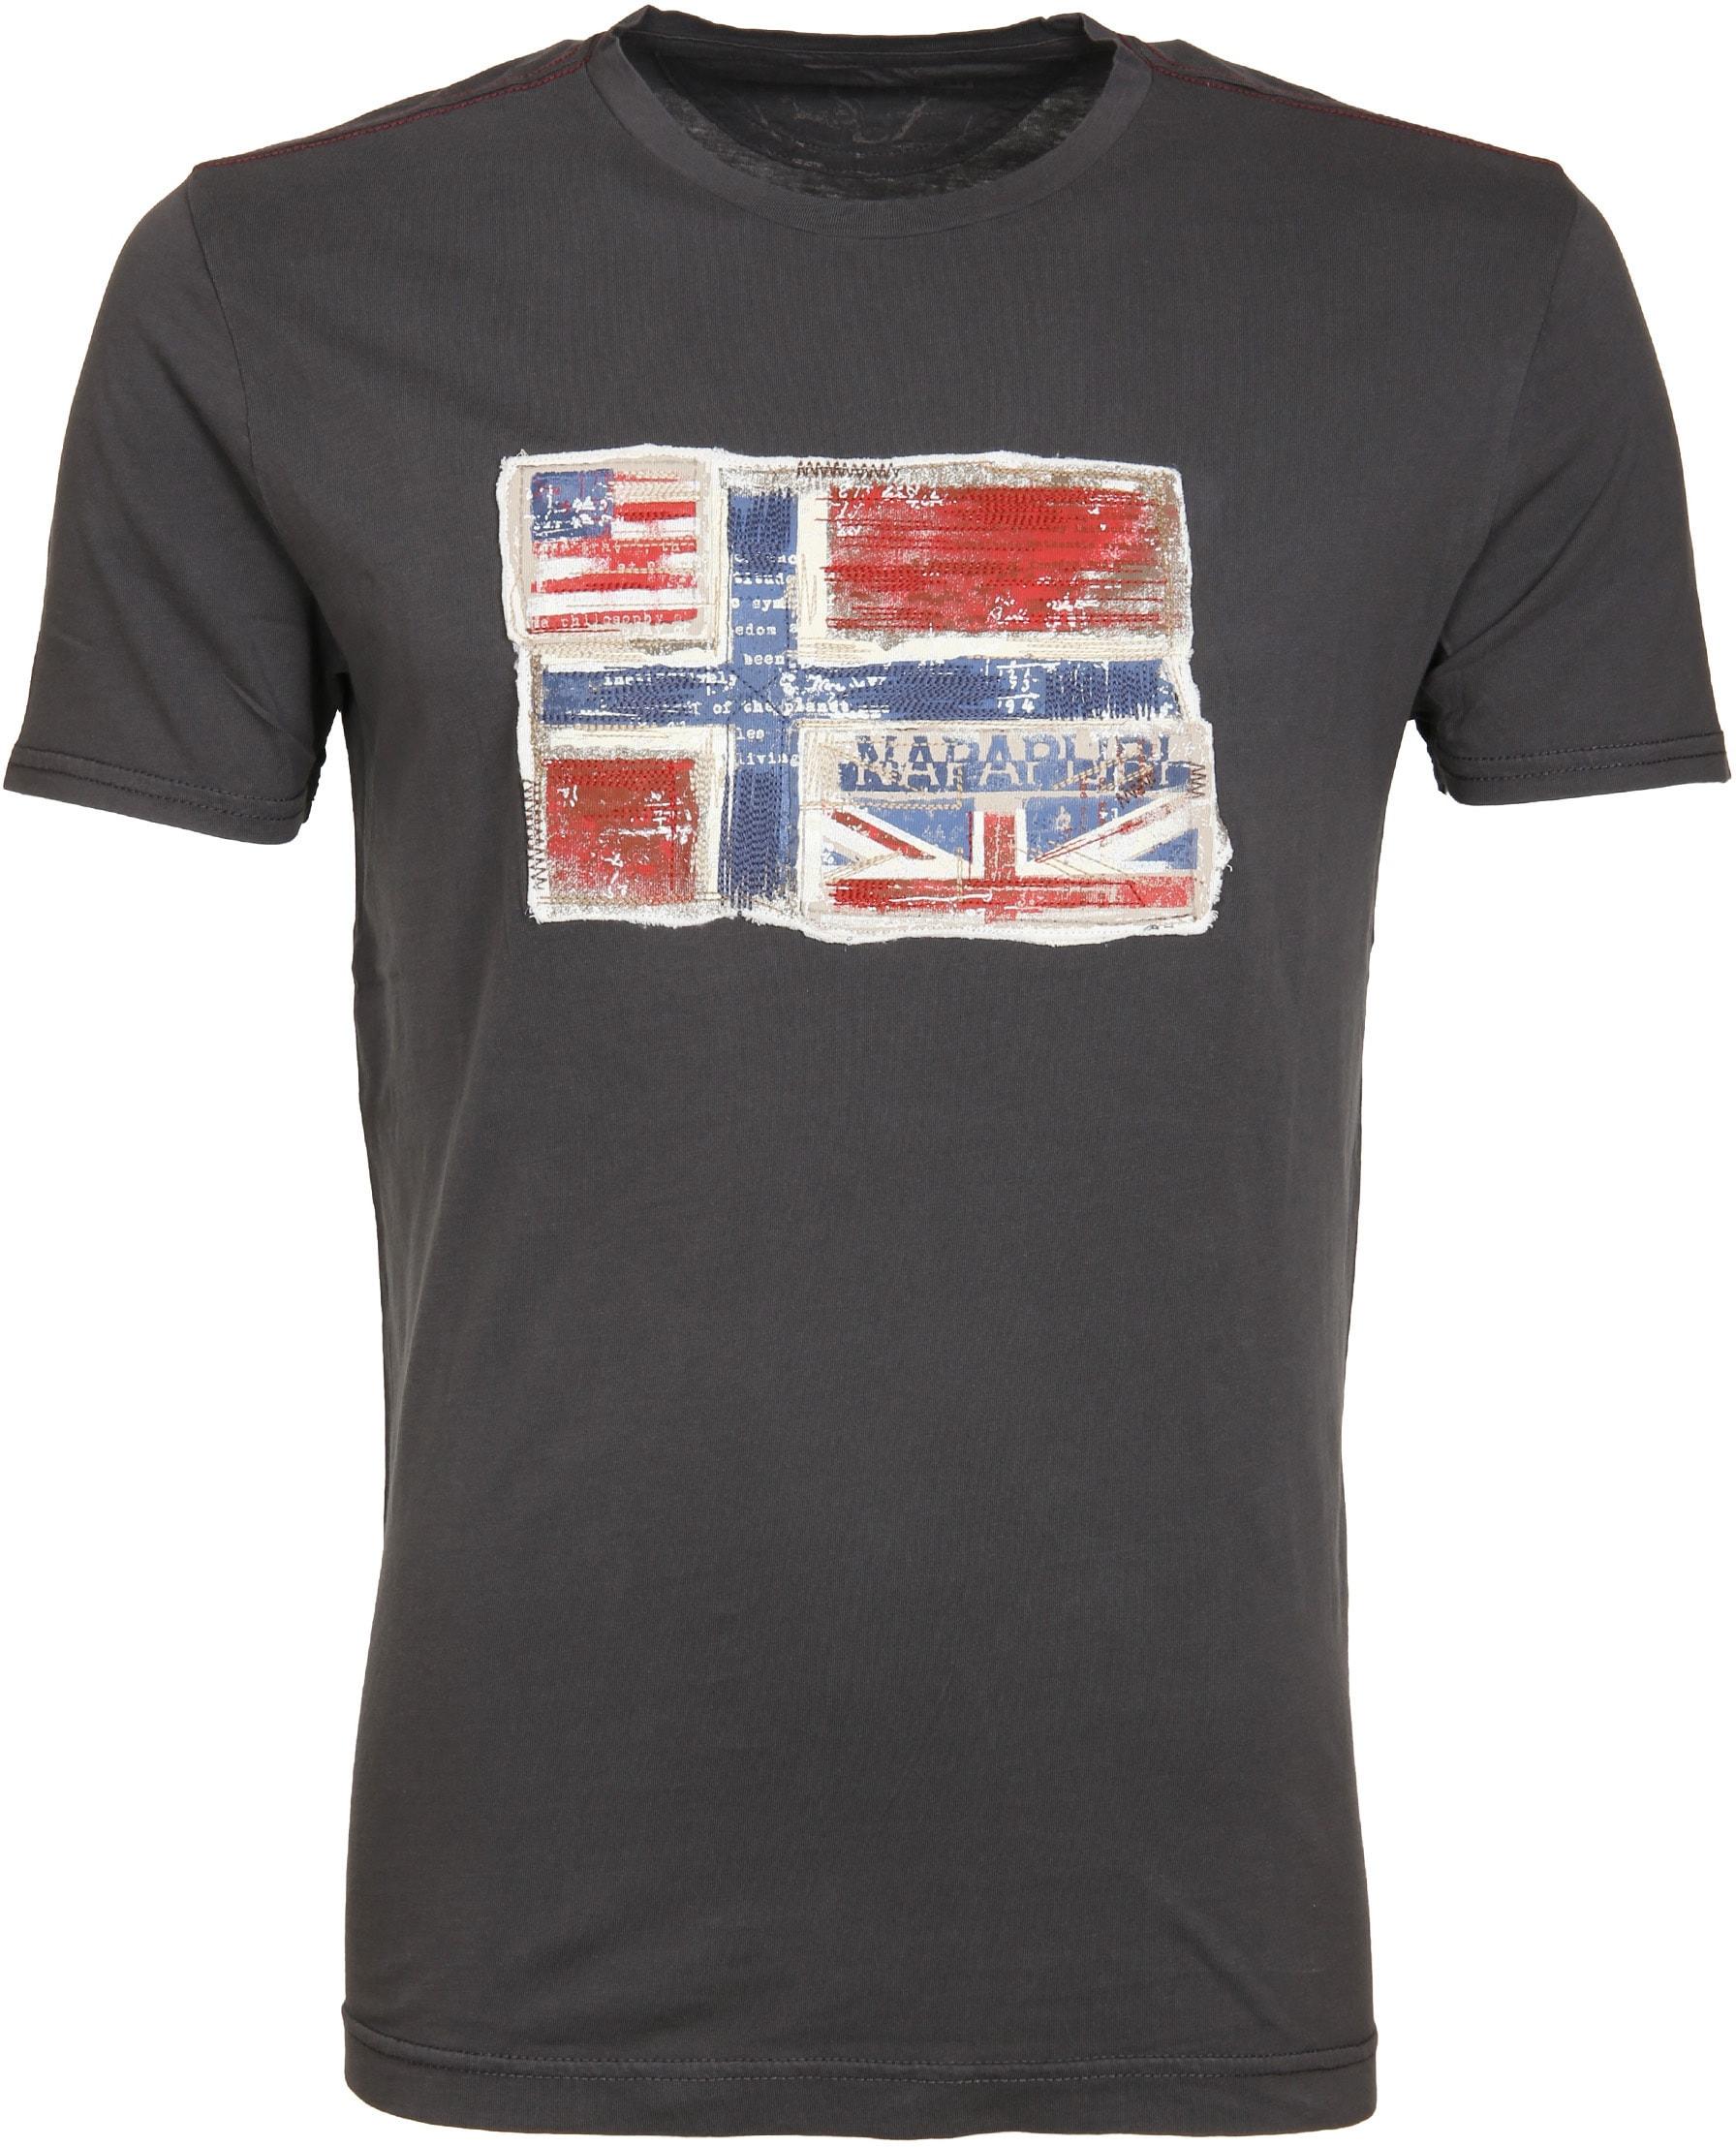 Napapijri T-shirt Senou Flag Antraciet foto 0